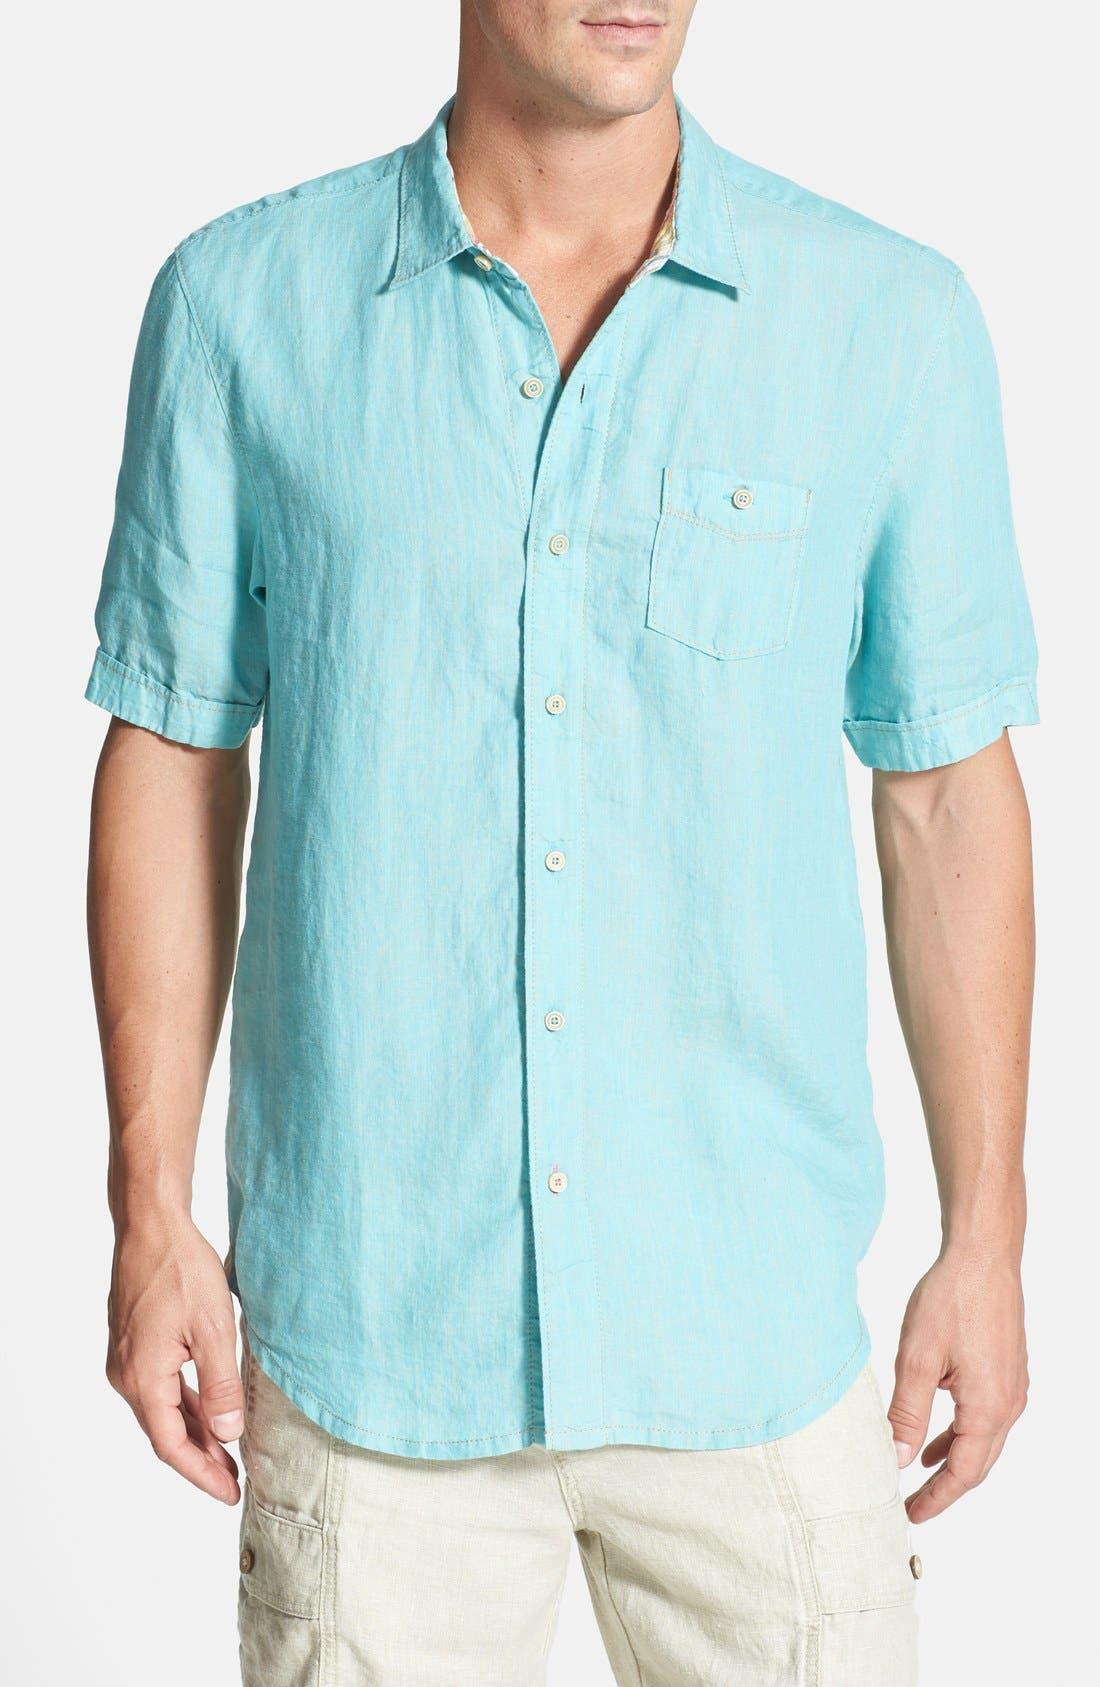 Alternate Image 1 Selected - Tommy Bahama 'Party Breezer' Short Sleeve Linen Sport Shirt